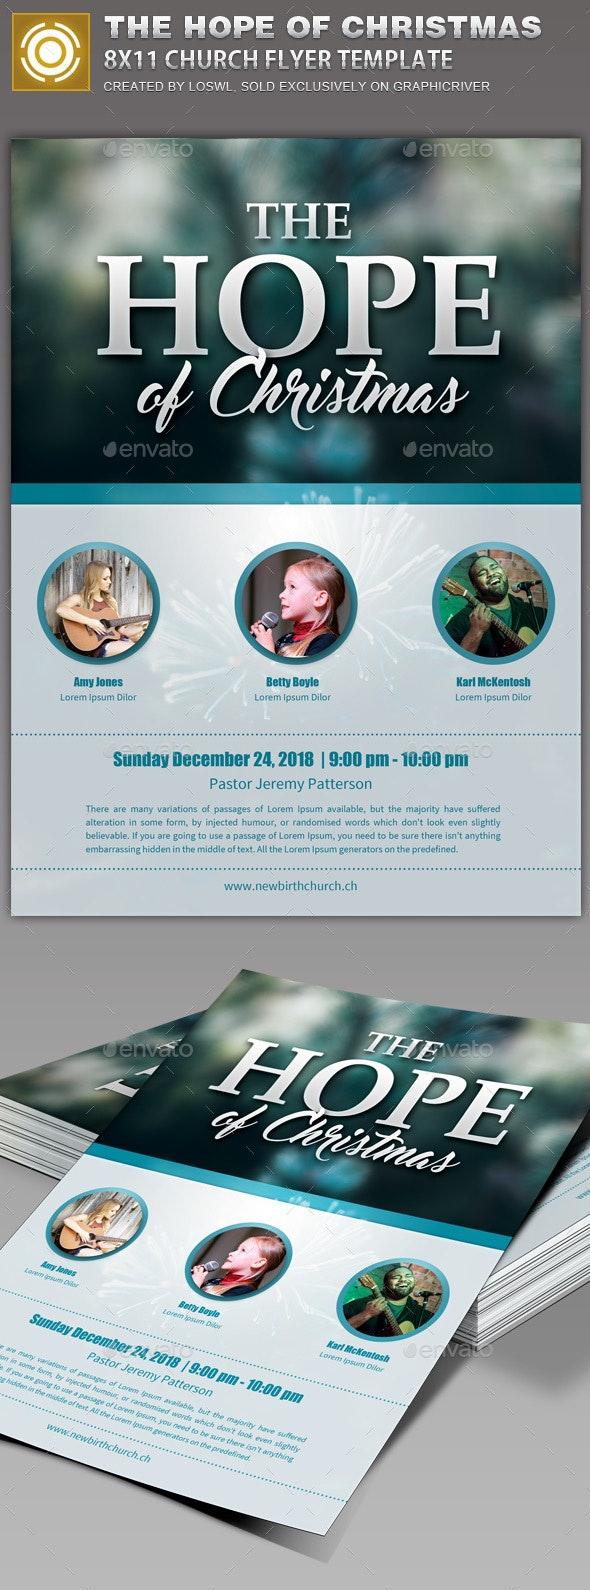 The Hope of Christmas Church Flyer Template - Church Flyers